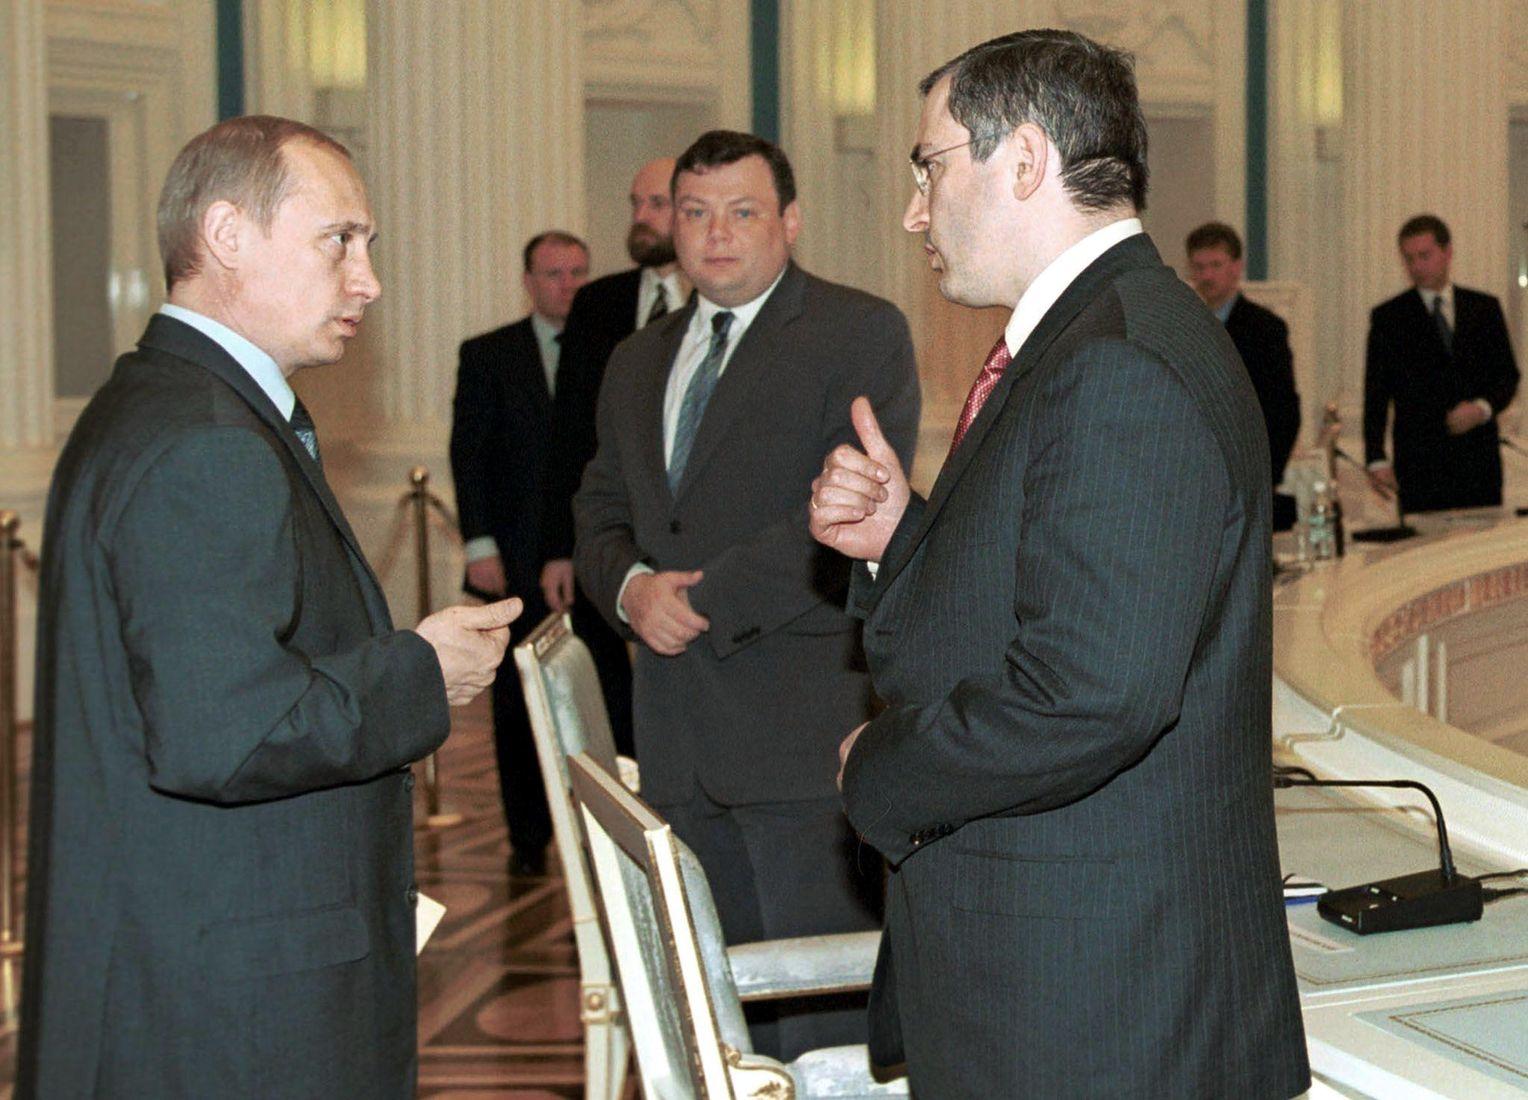 Путин и Ходорковский 31 мая 2001 года